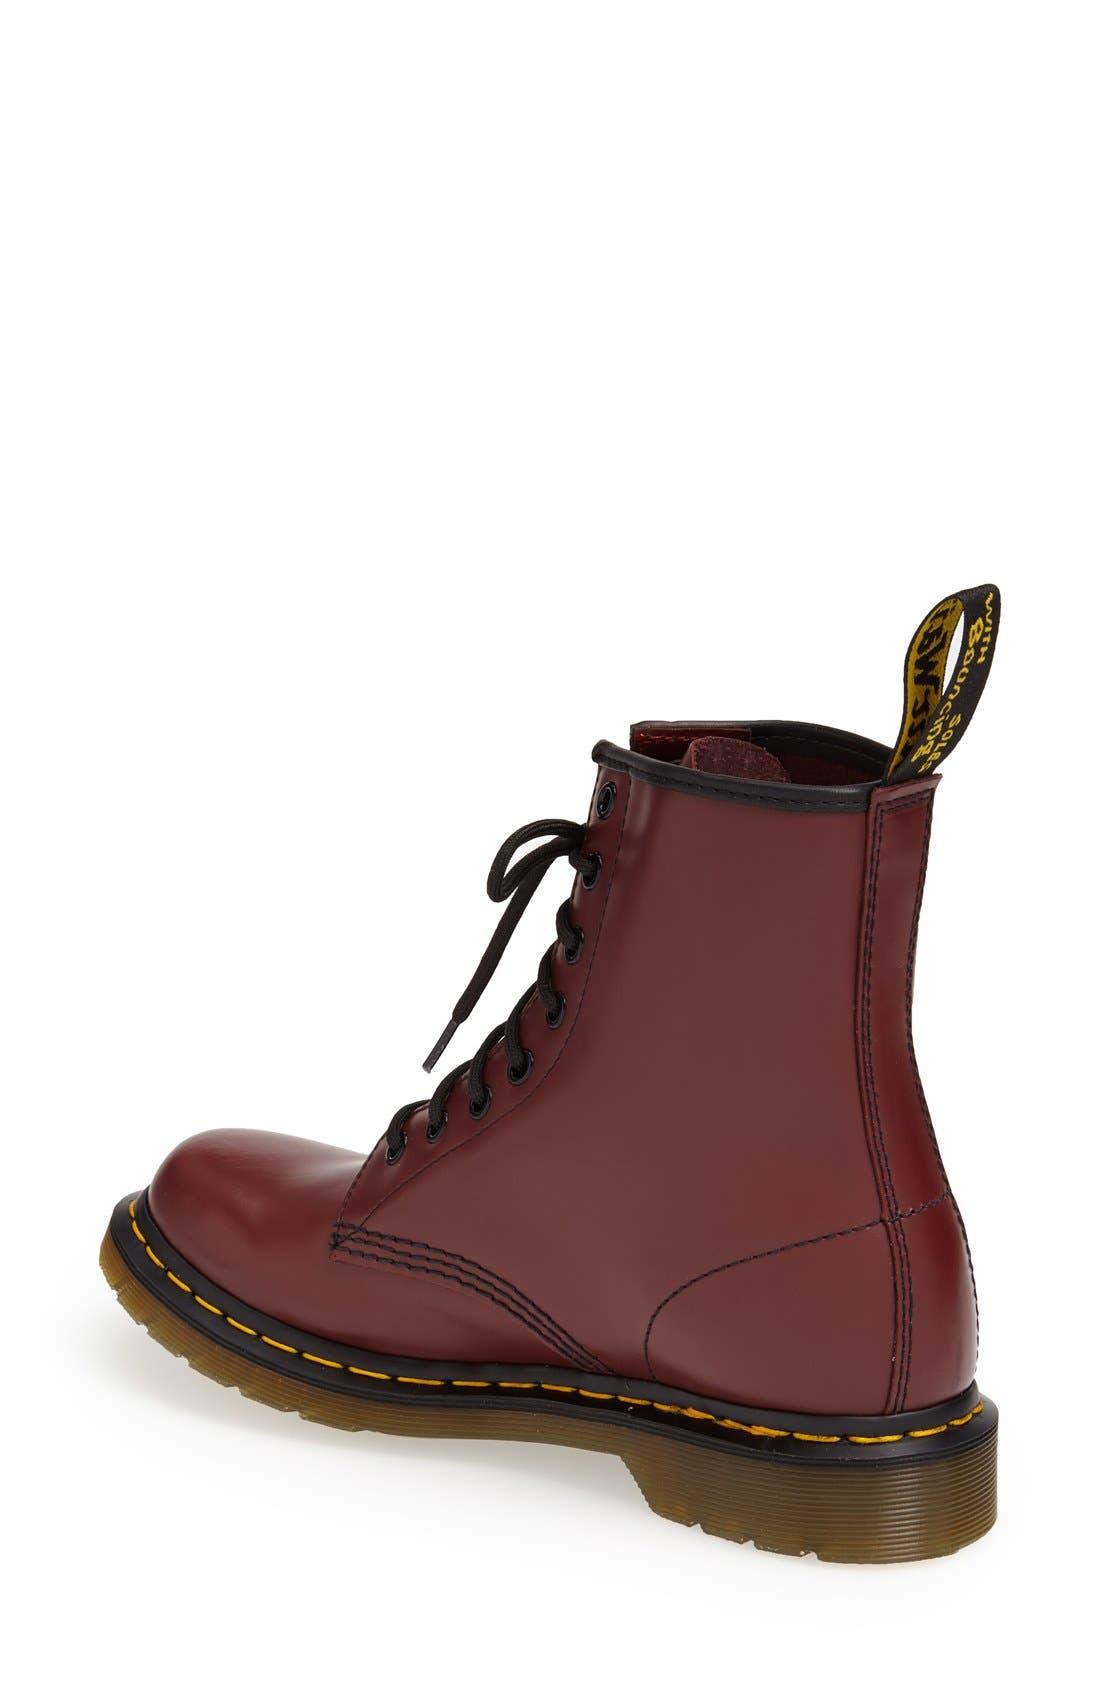 DR. MARTENS, '1460 W' Boot, Alternate thumbnail 2, color, CHERRY